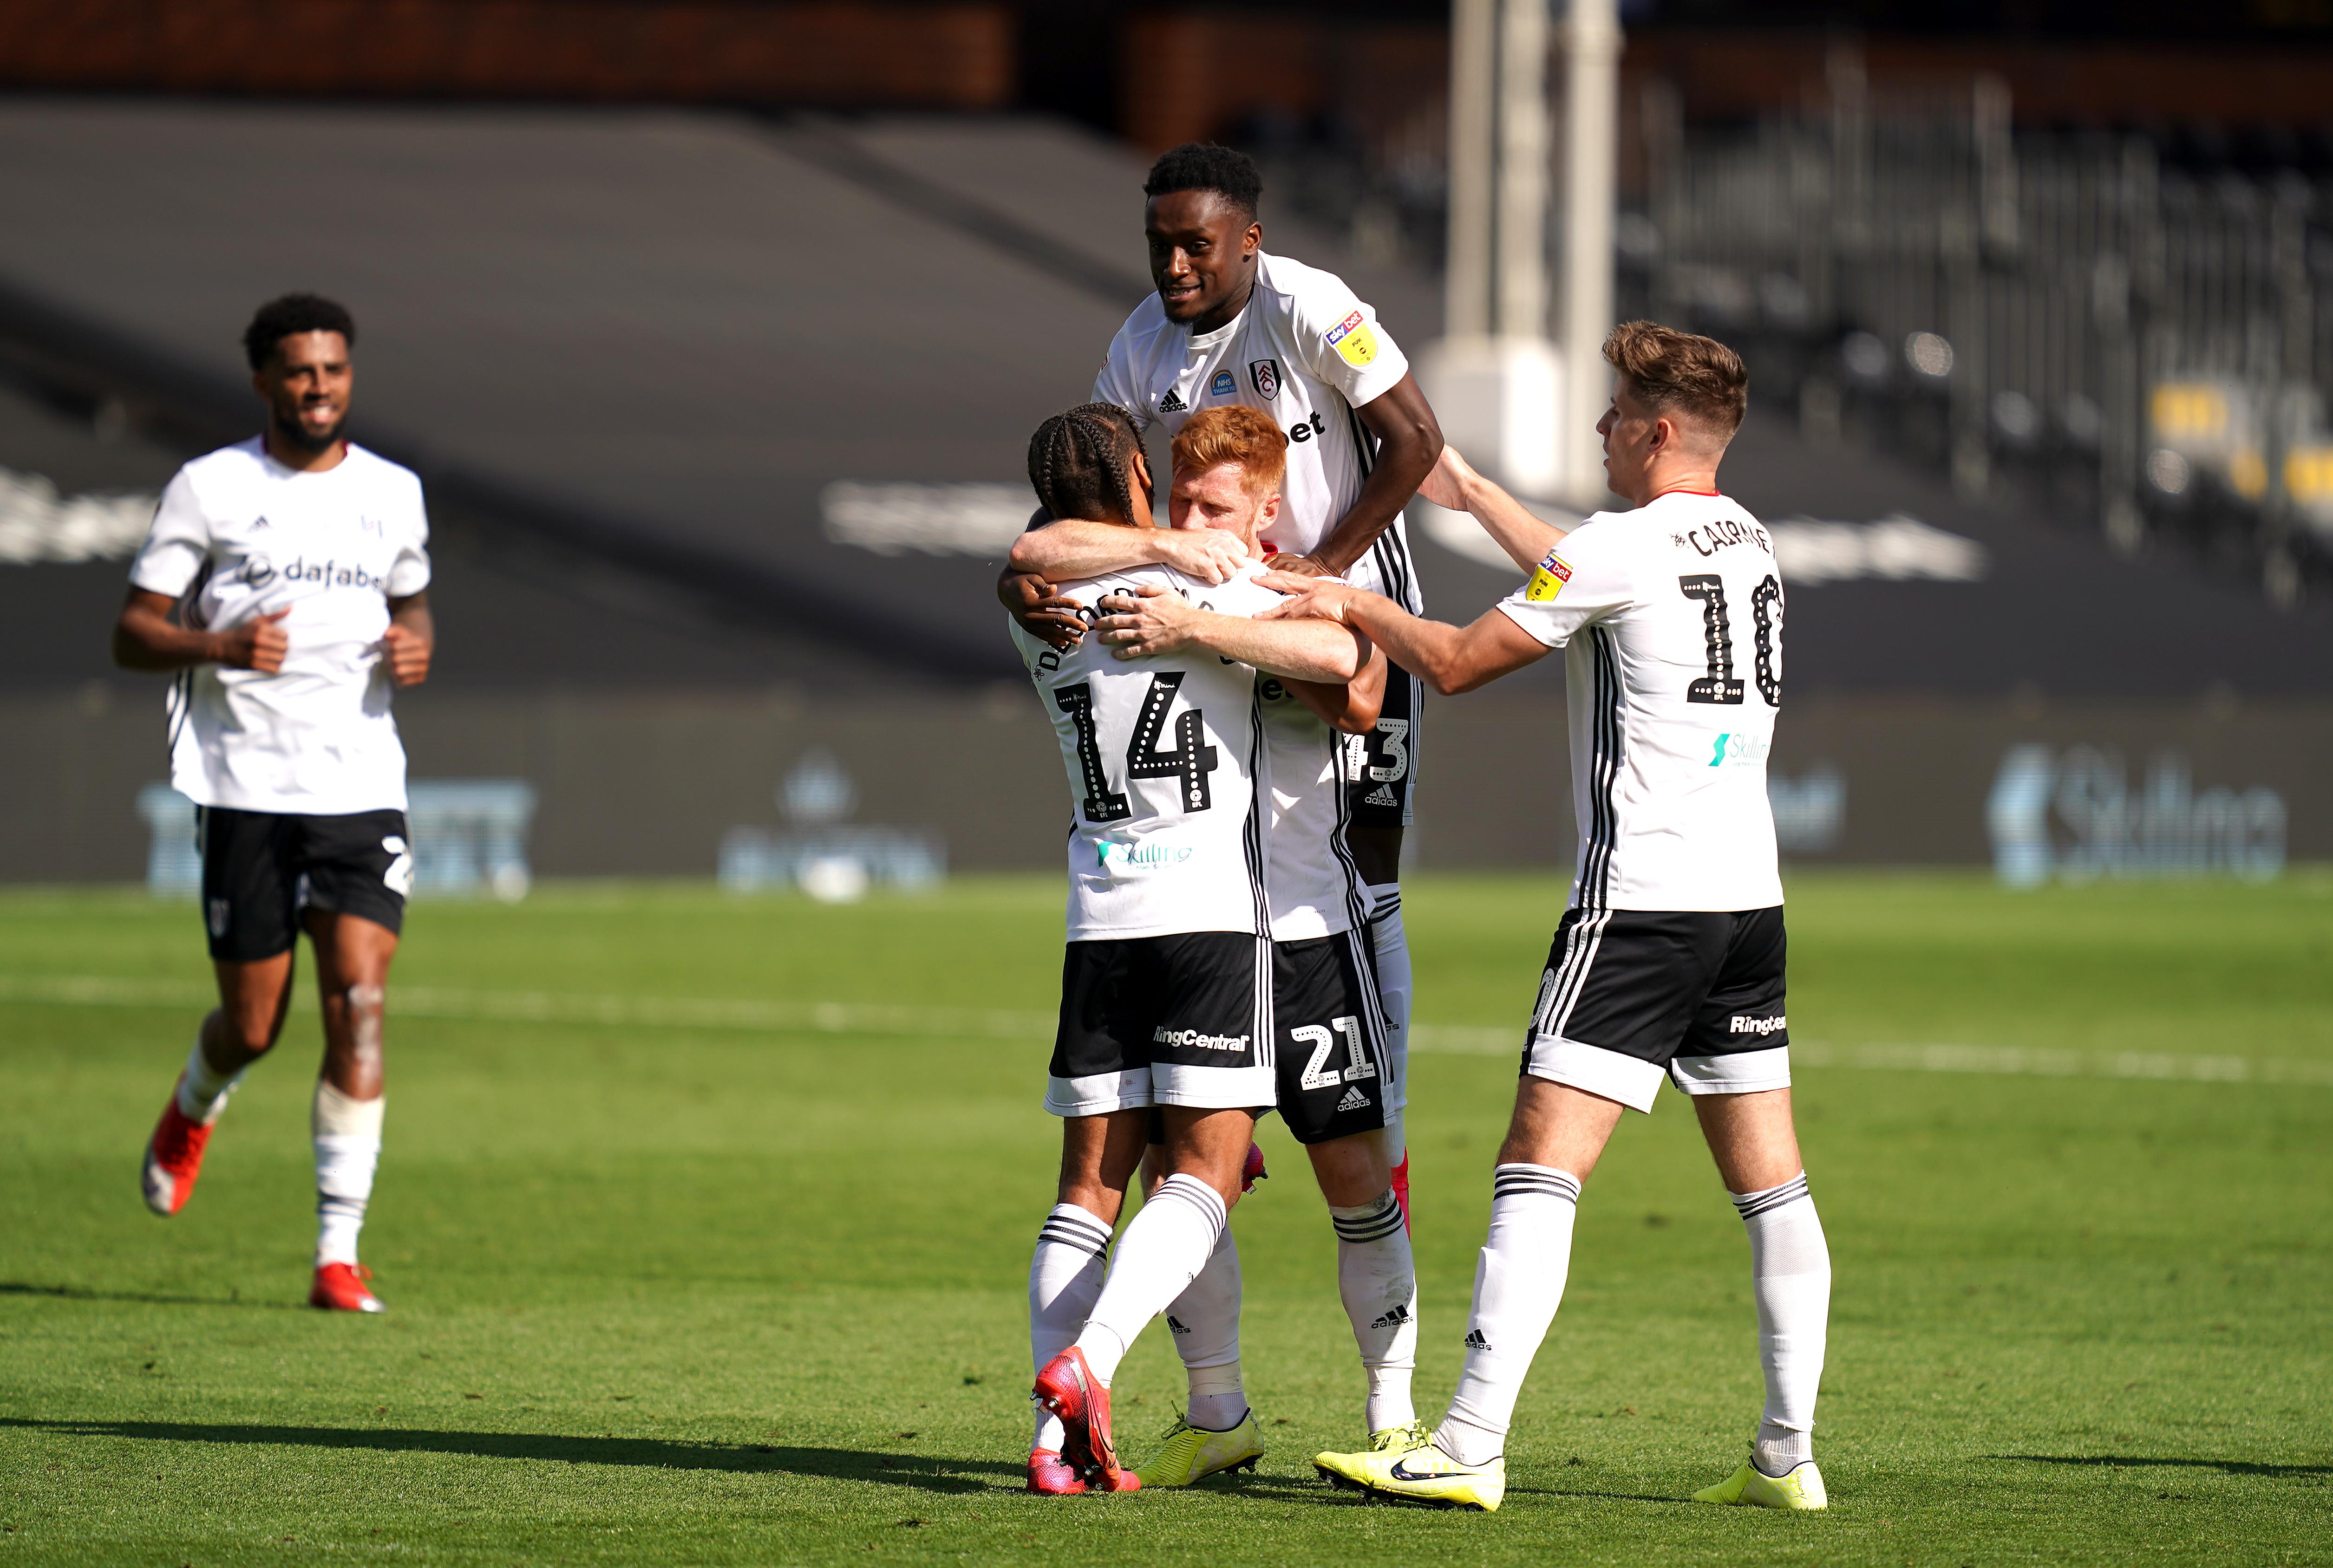 Fulham v Sheffield Wednesday - Sky Bet Championship - Craven Cottage